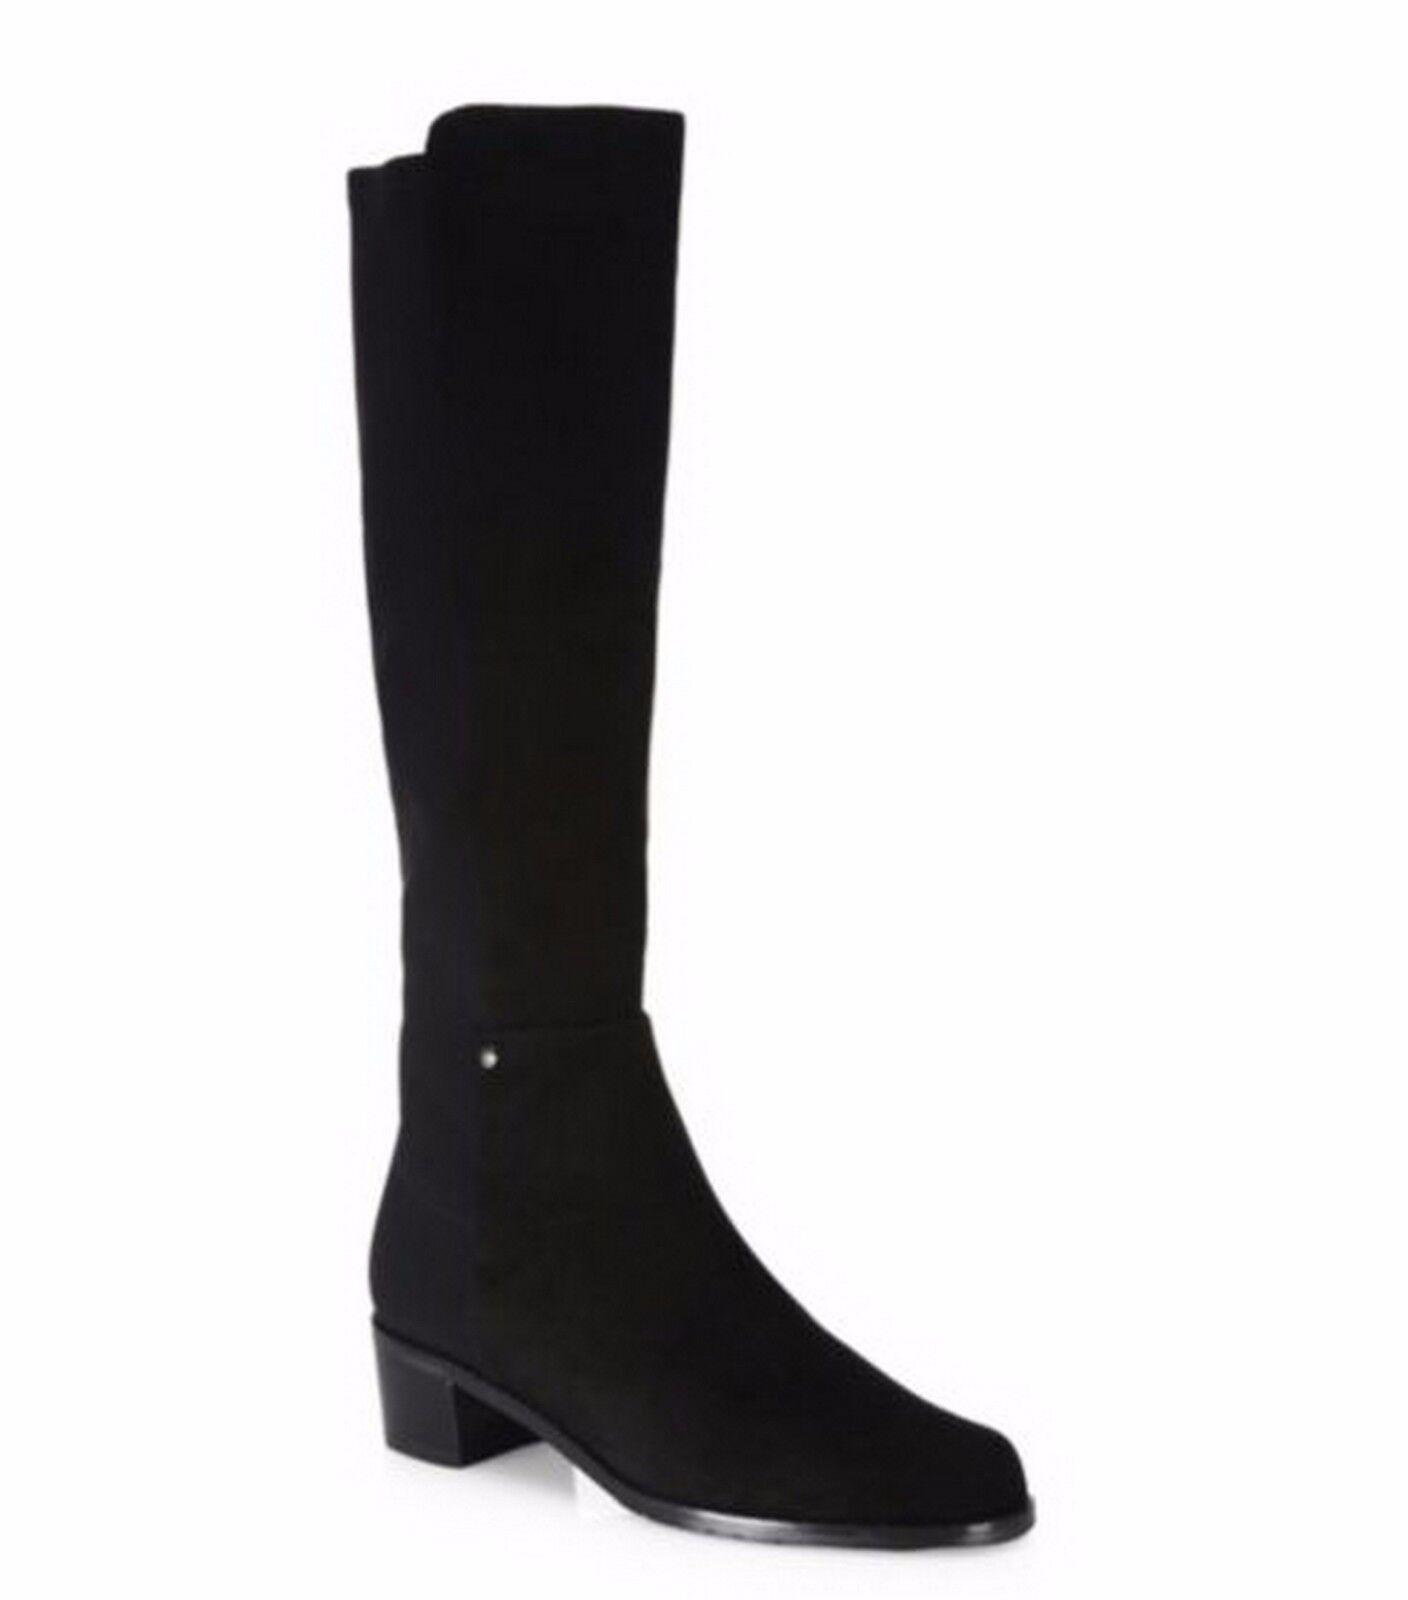 New Stuart Weitzman Mezzaluna Classic Tall Suede Boots Shoe, Black~�@46% OFF